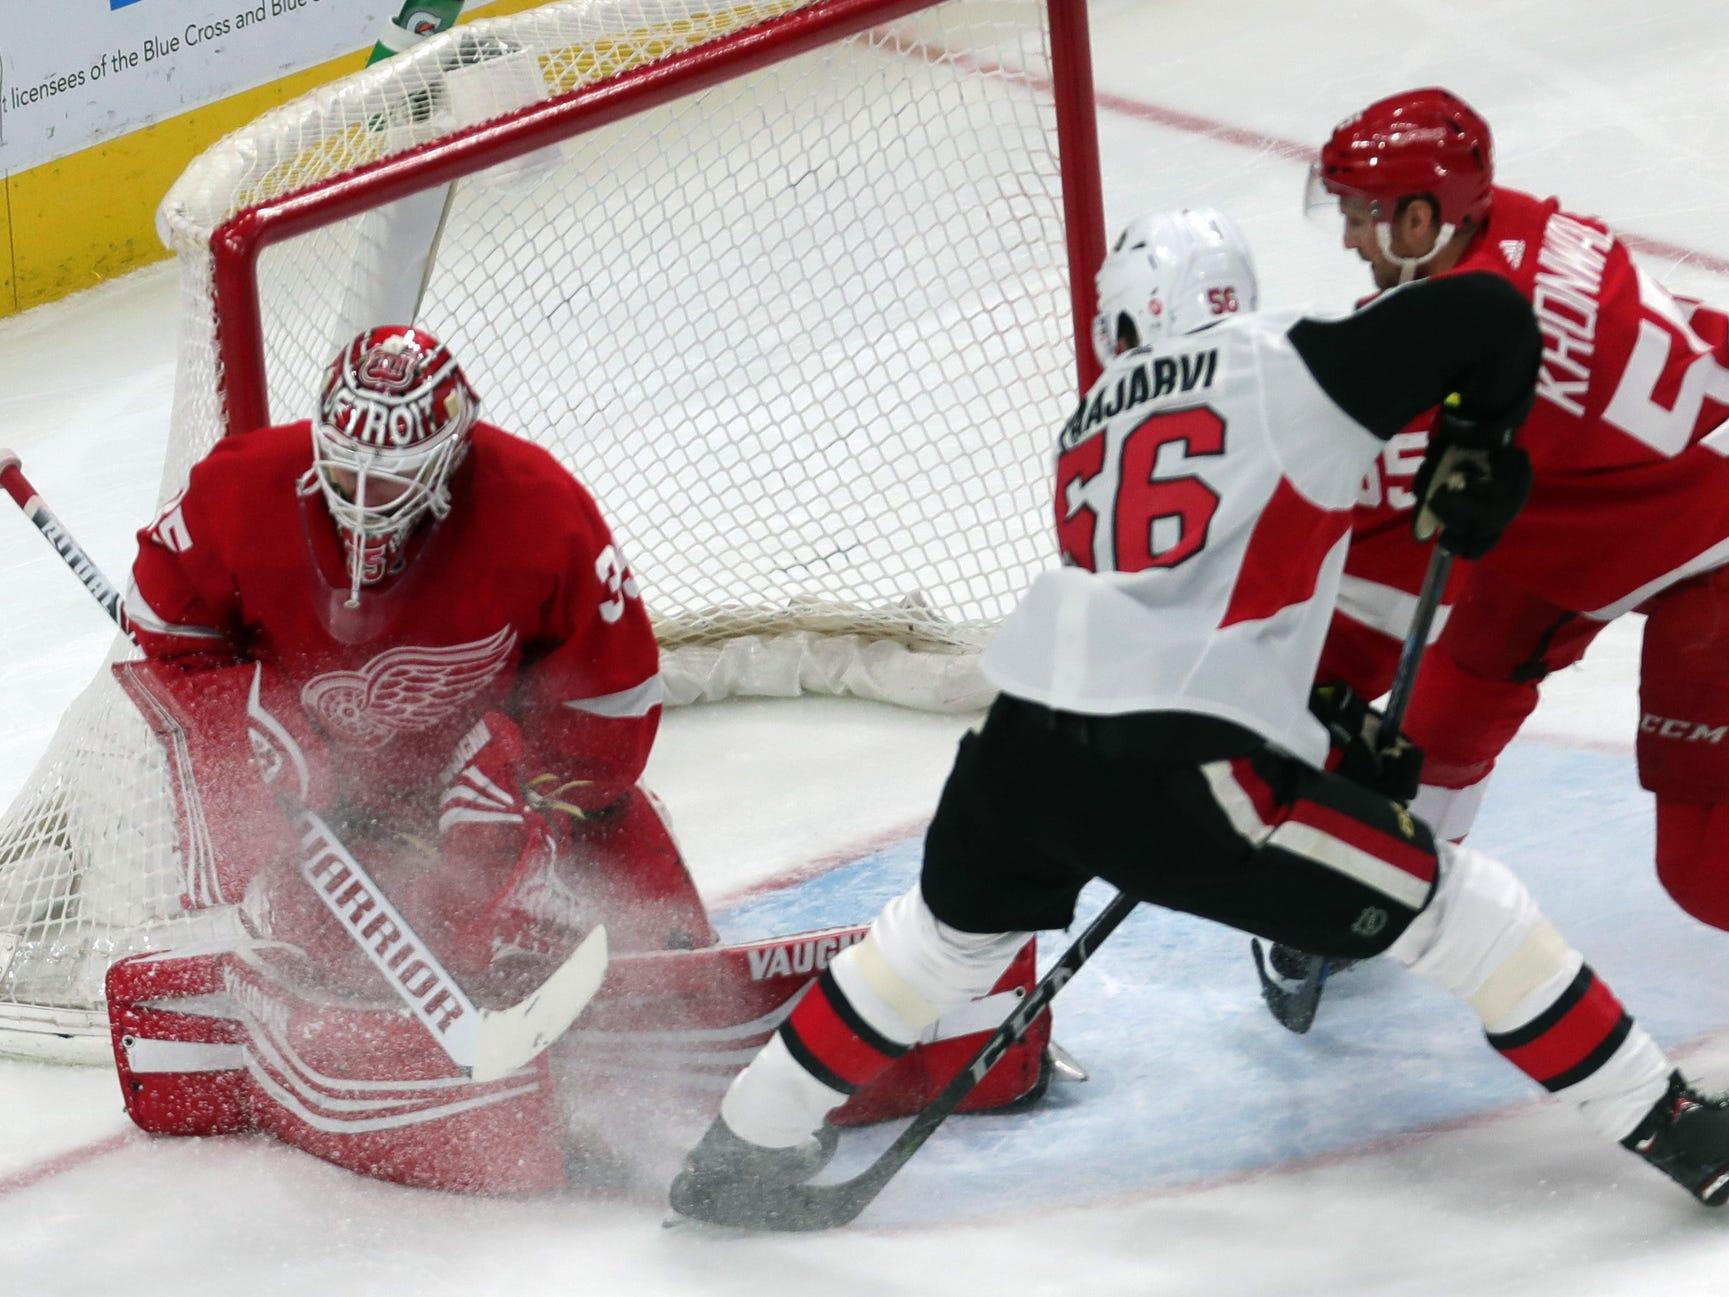 Detroit Red Wings goalie Jimmy Howard, left, makes a save against Senators left wing Magnus Paajarvi on Thursday, FEb. 14, 2019, in Detroit.